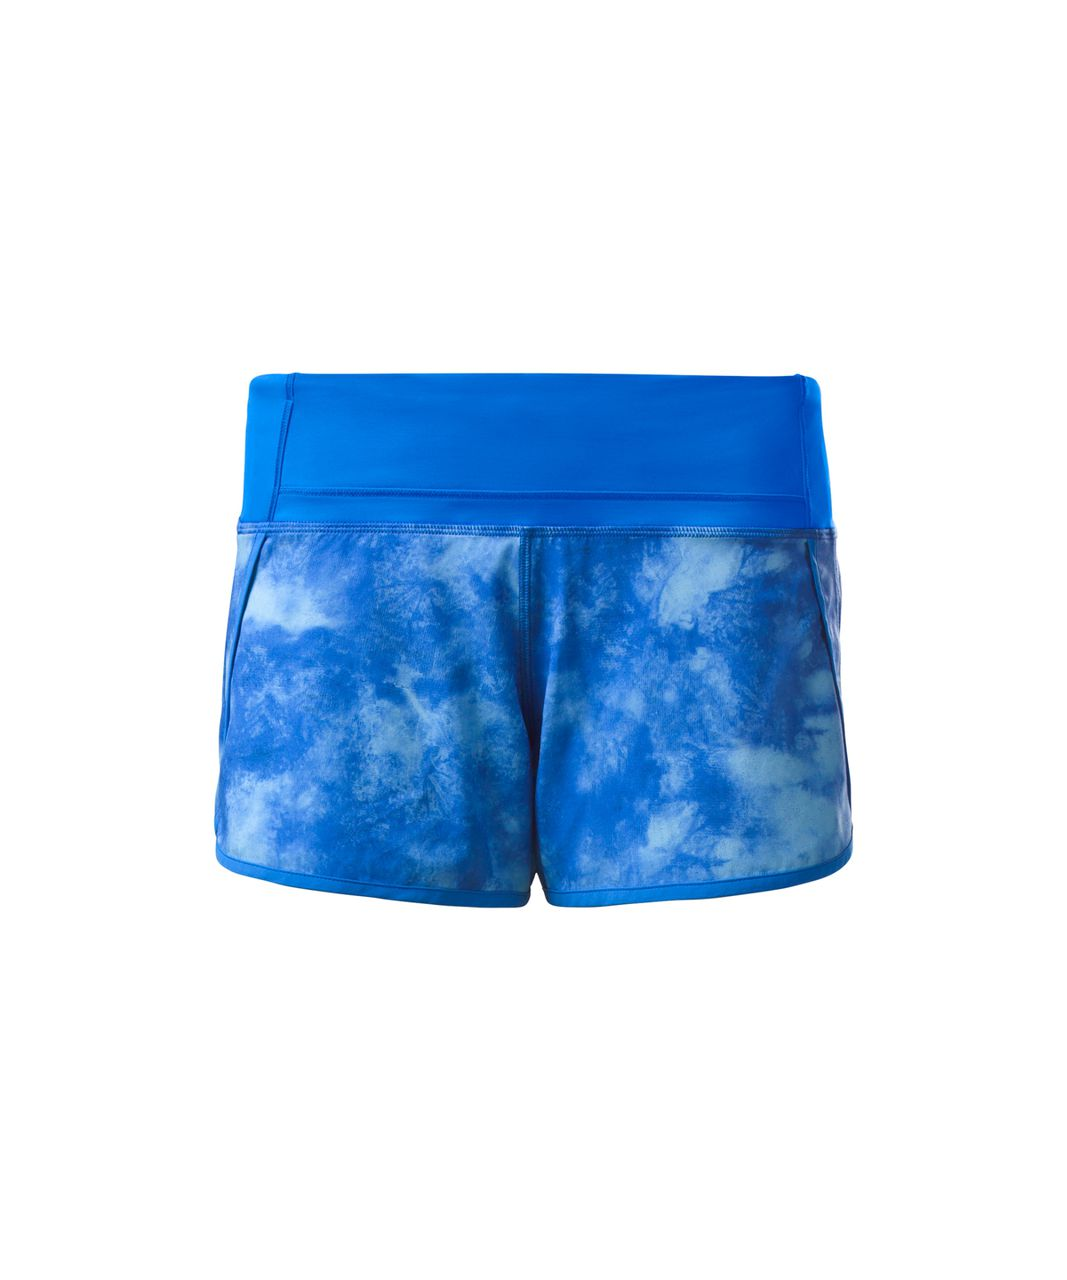 Lululemon Run Times Short (4-way Stretch) - Tidal Trip Pipe Dream Blue / Pipe Dream Blue